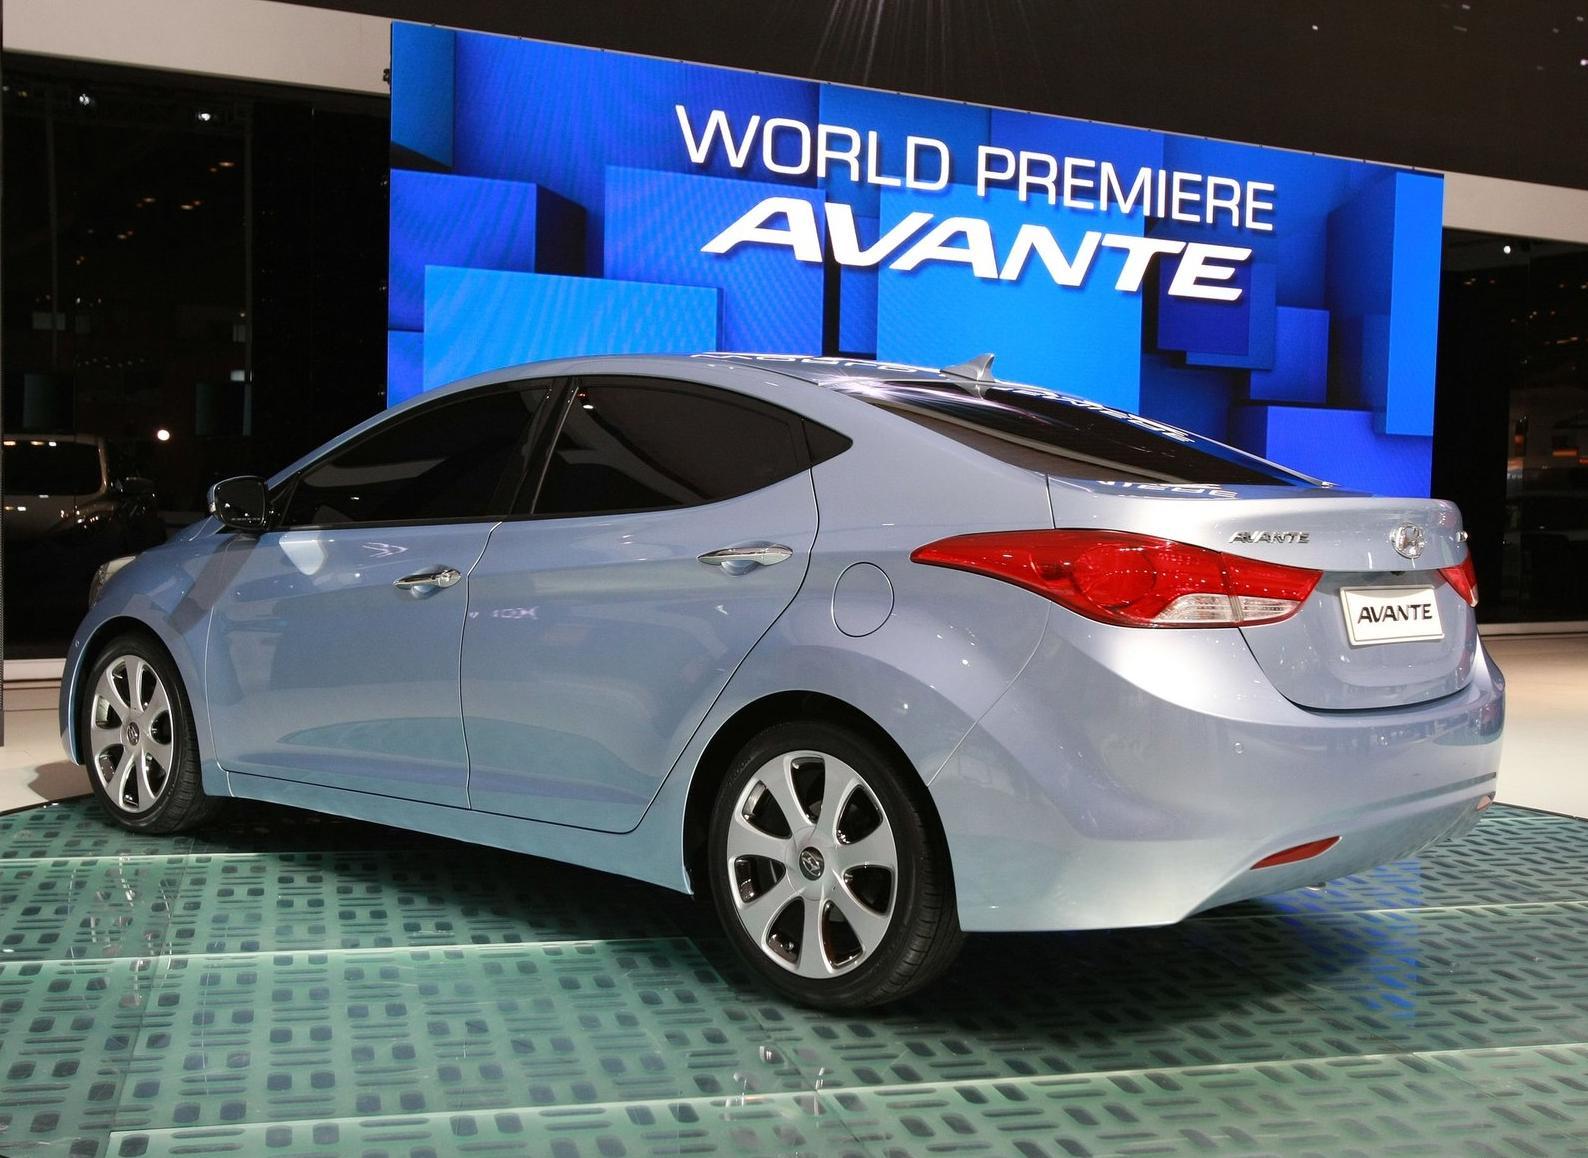 2011 Hyundai Elantra Image 6